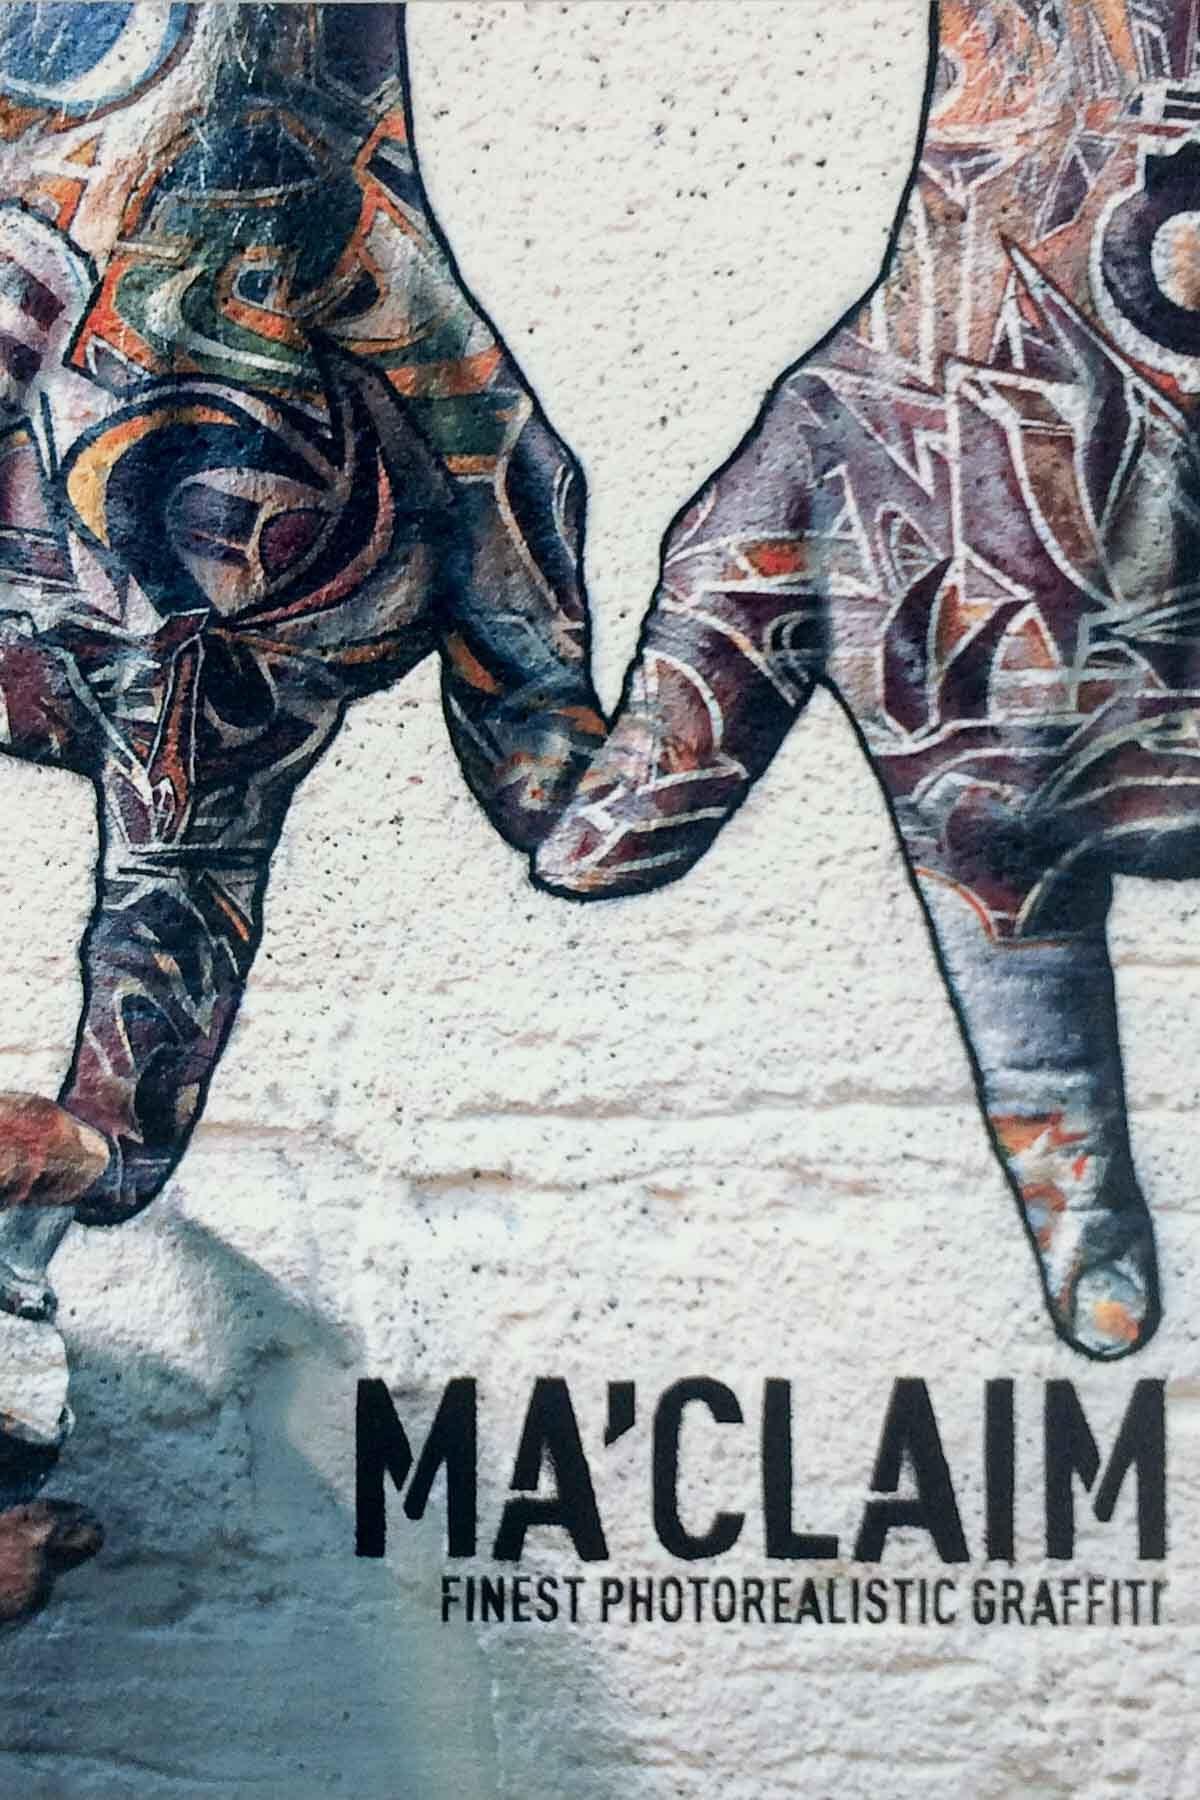 MA'CLAIM - Finest photorealistic graffiti di Falk Lehmann